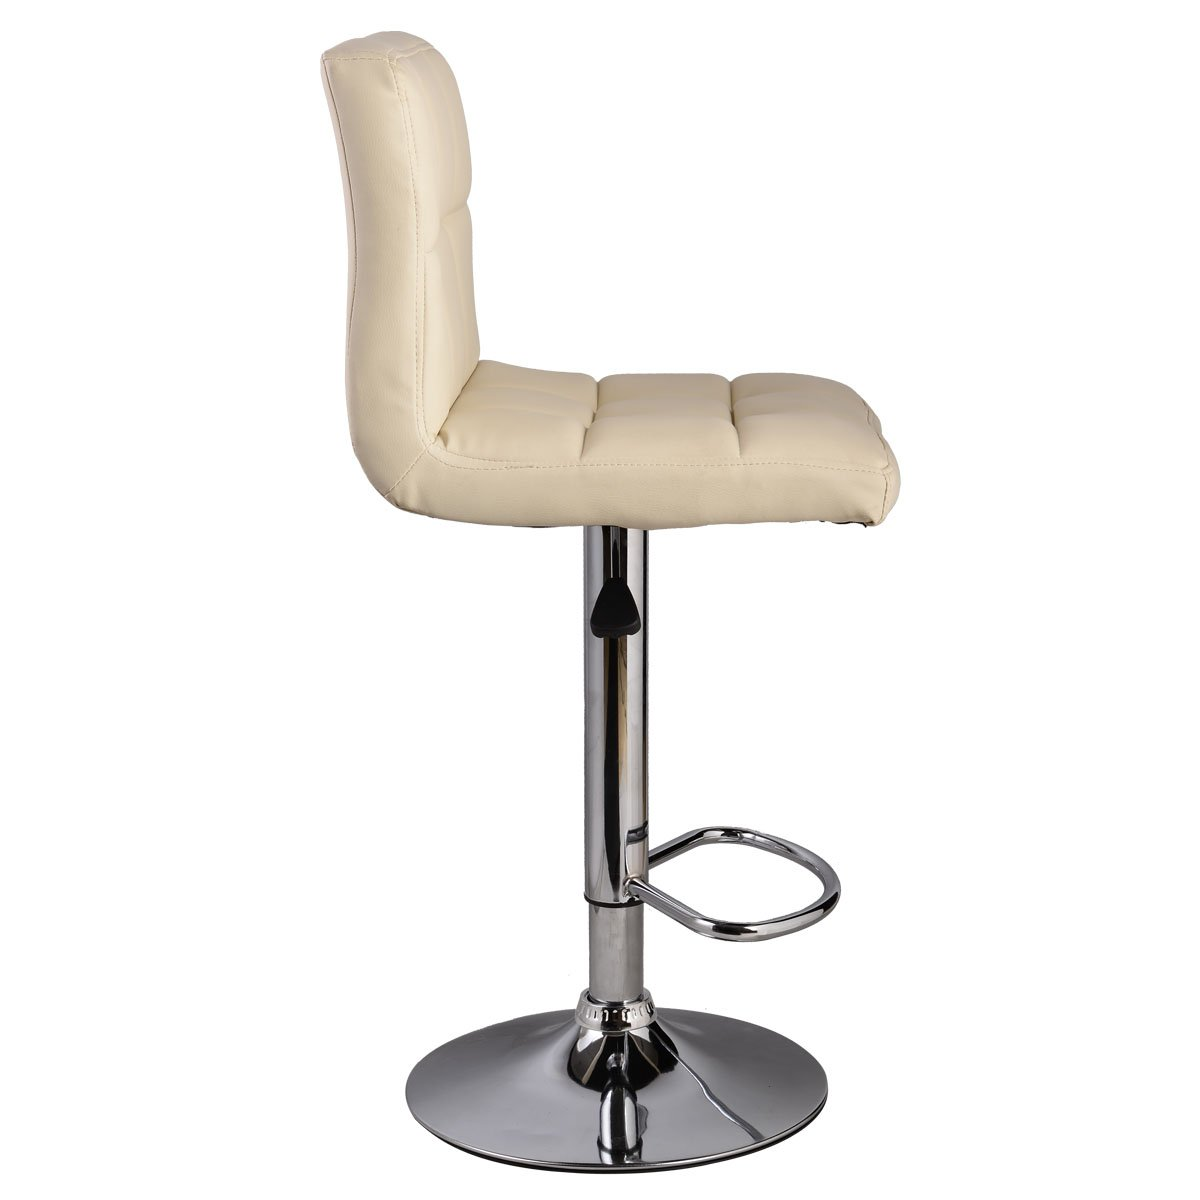 amazoncom set of  bar stool pu leather barstools chair adjustablecounter swivel pub kitchen  dining. amazoncom set of  bar stool pu leather barstools chair